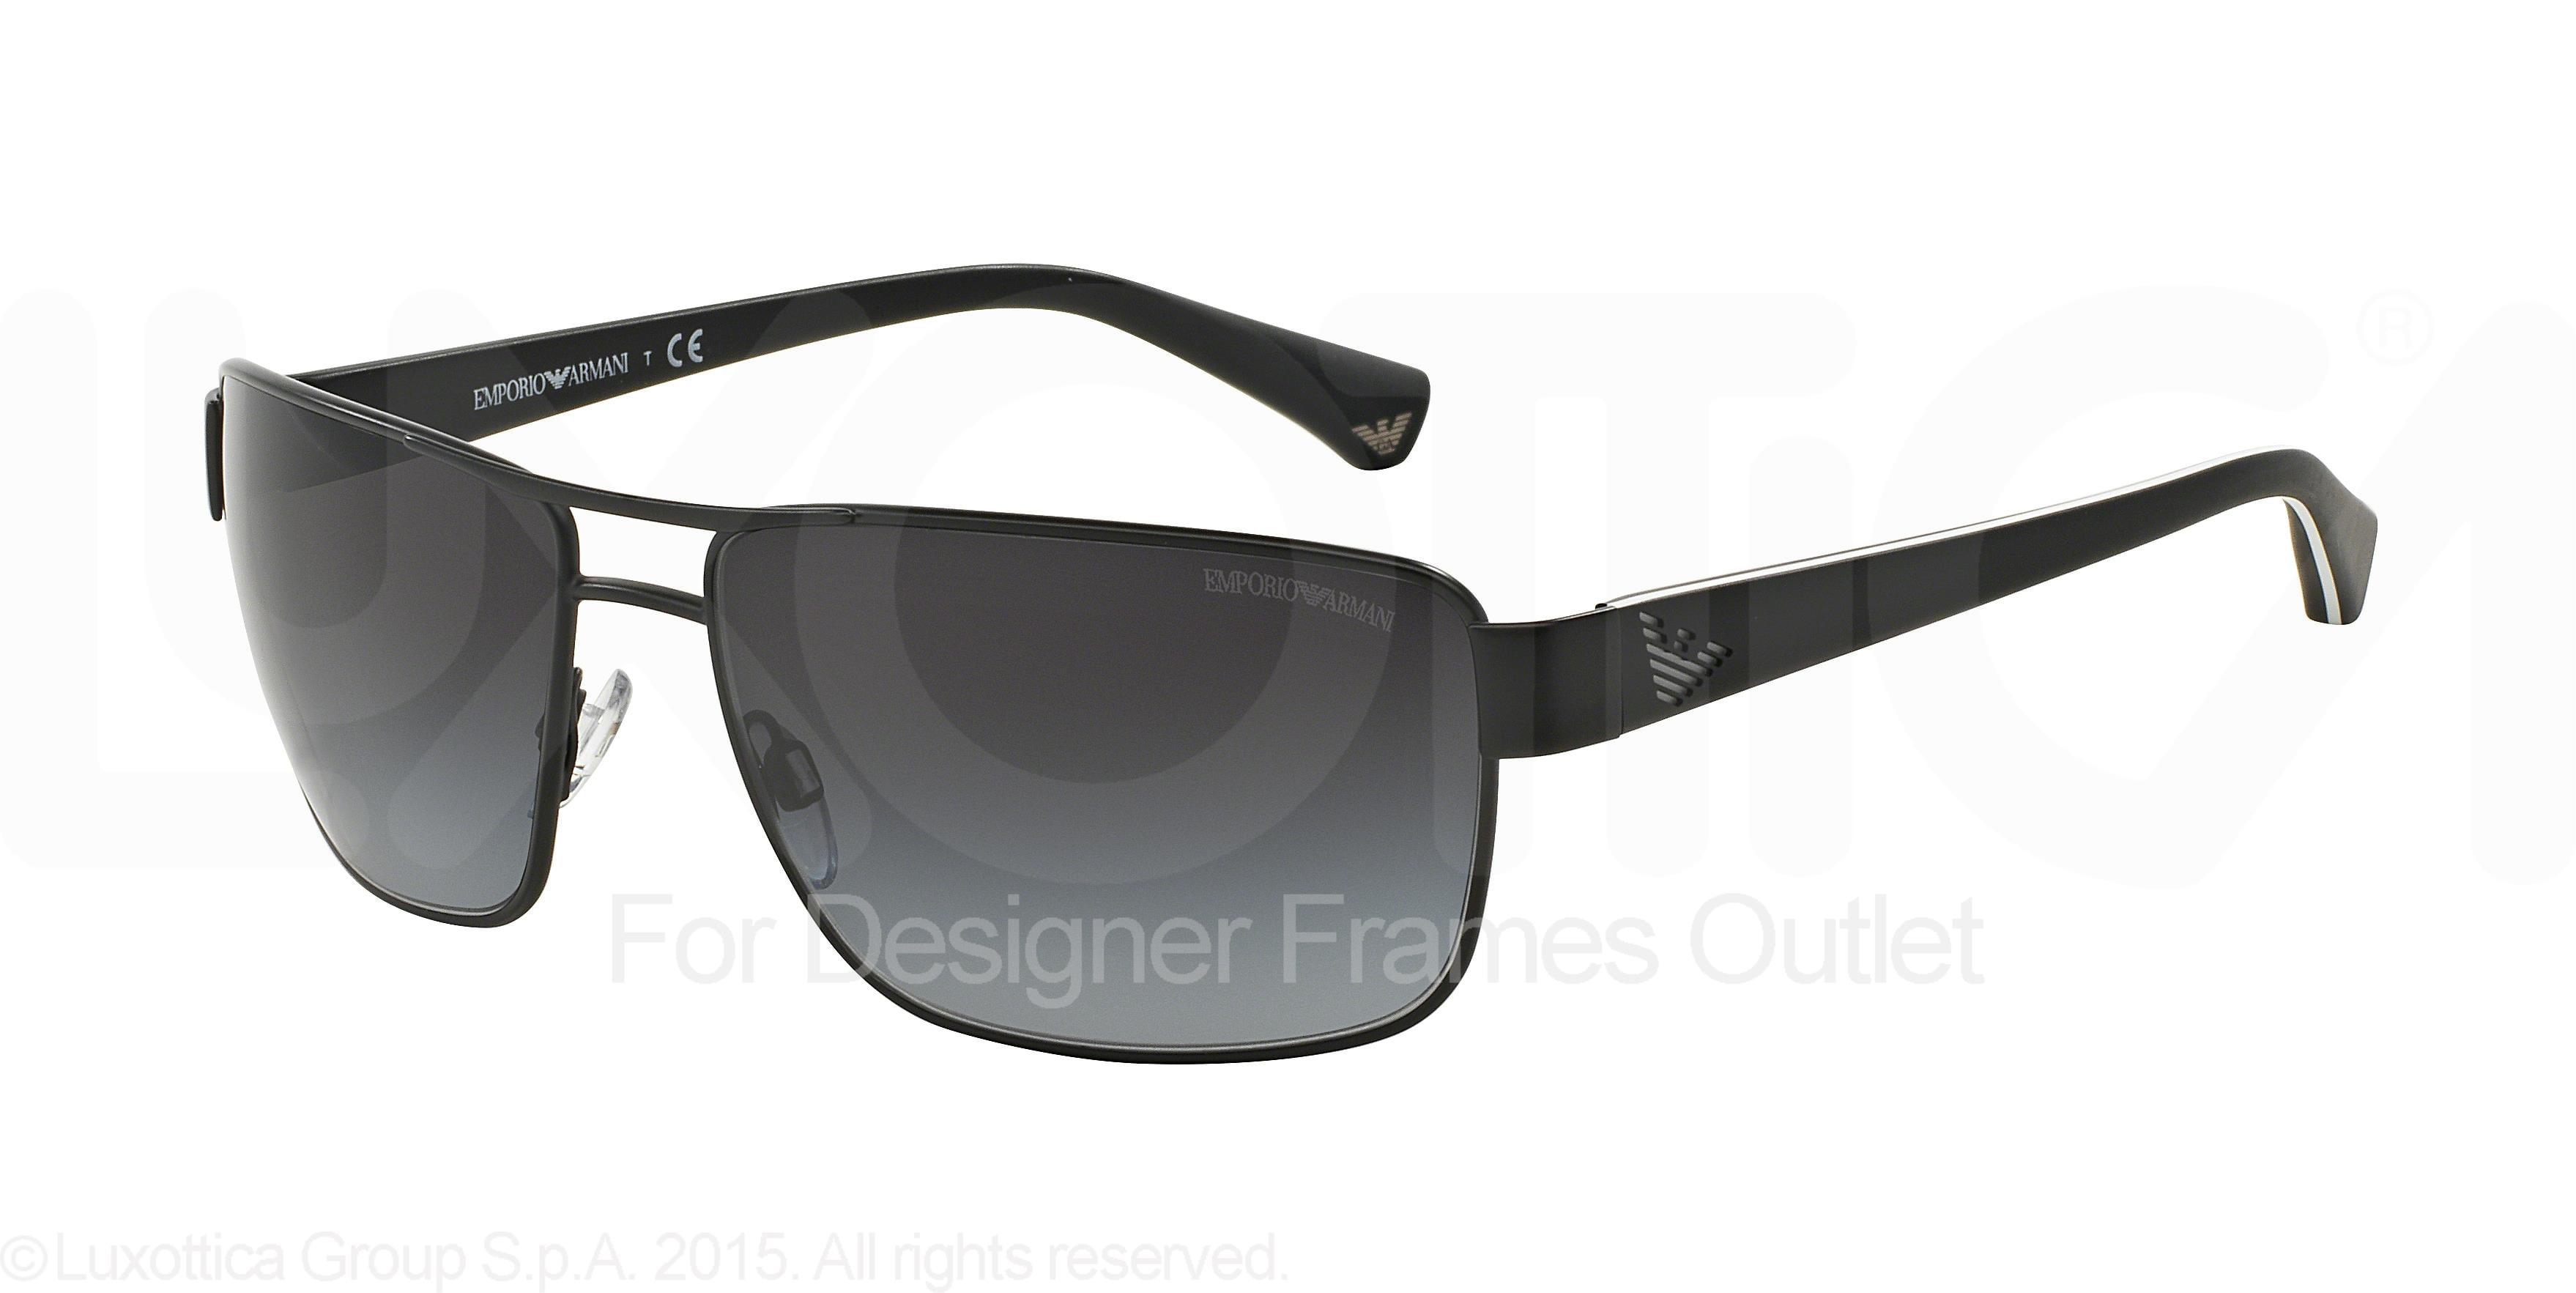 Emporio Armani EA2031 31098G 62-15 in black dwl6GY